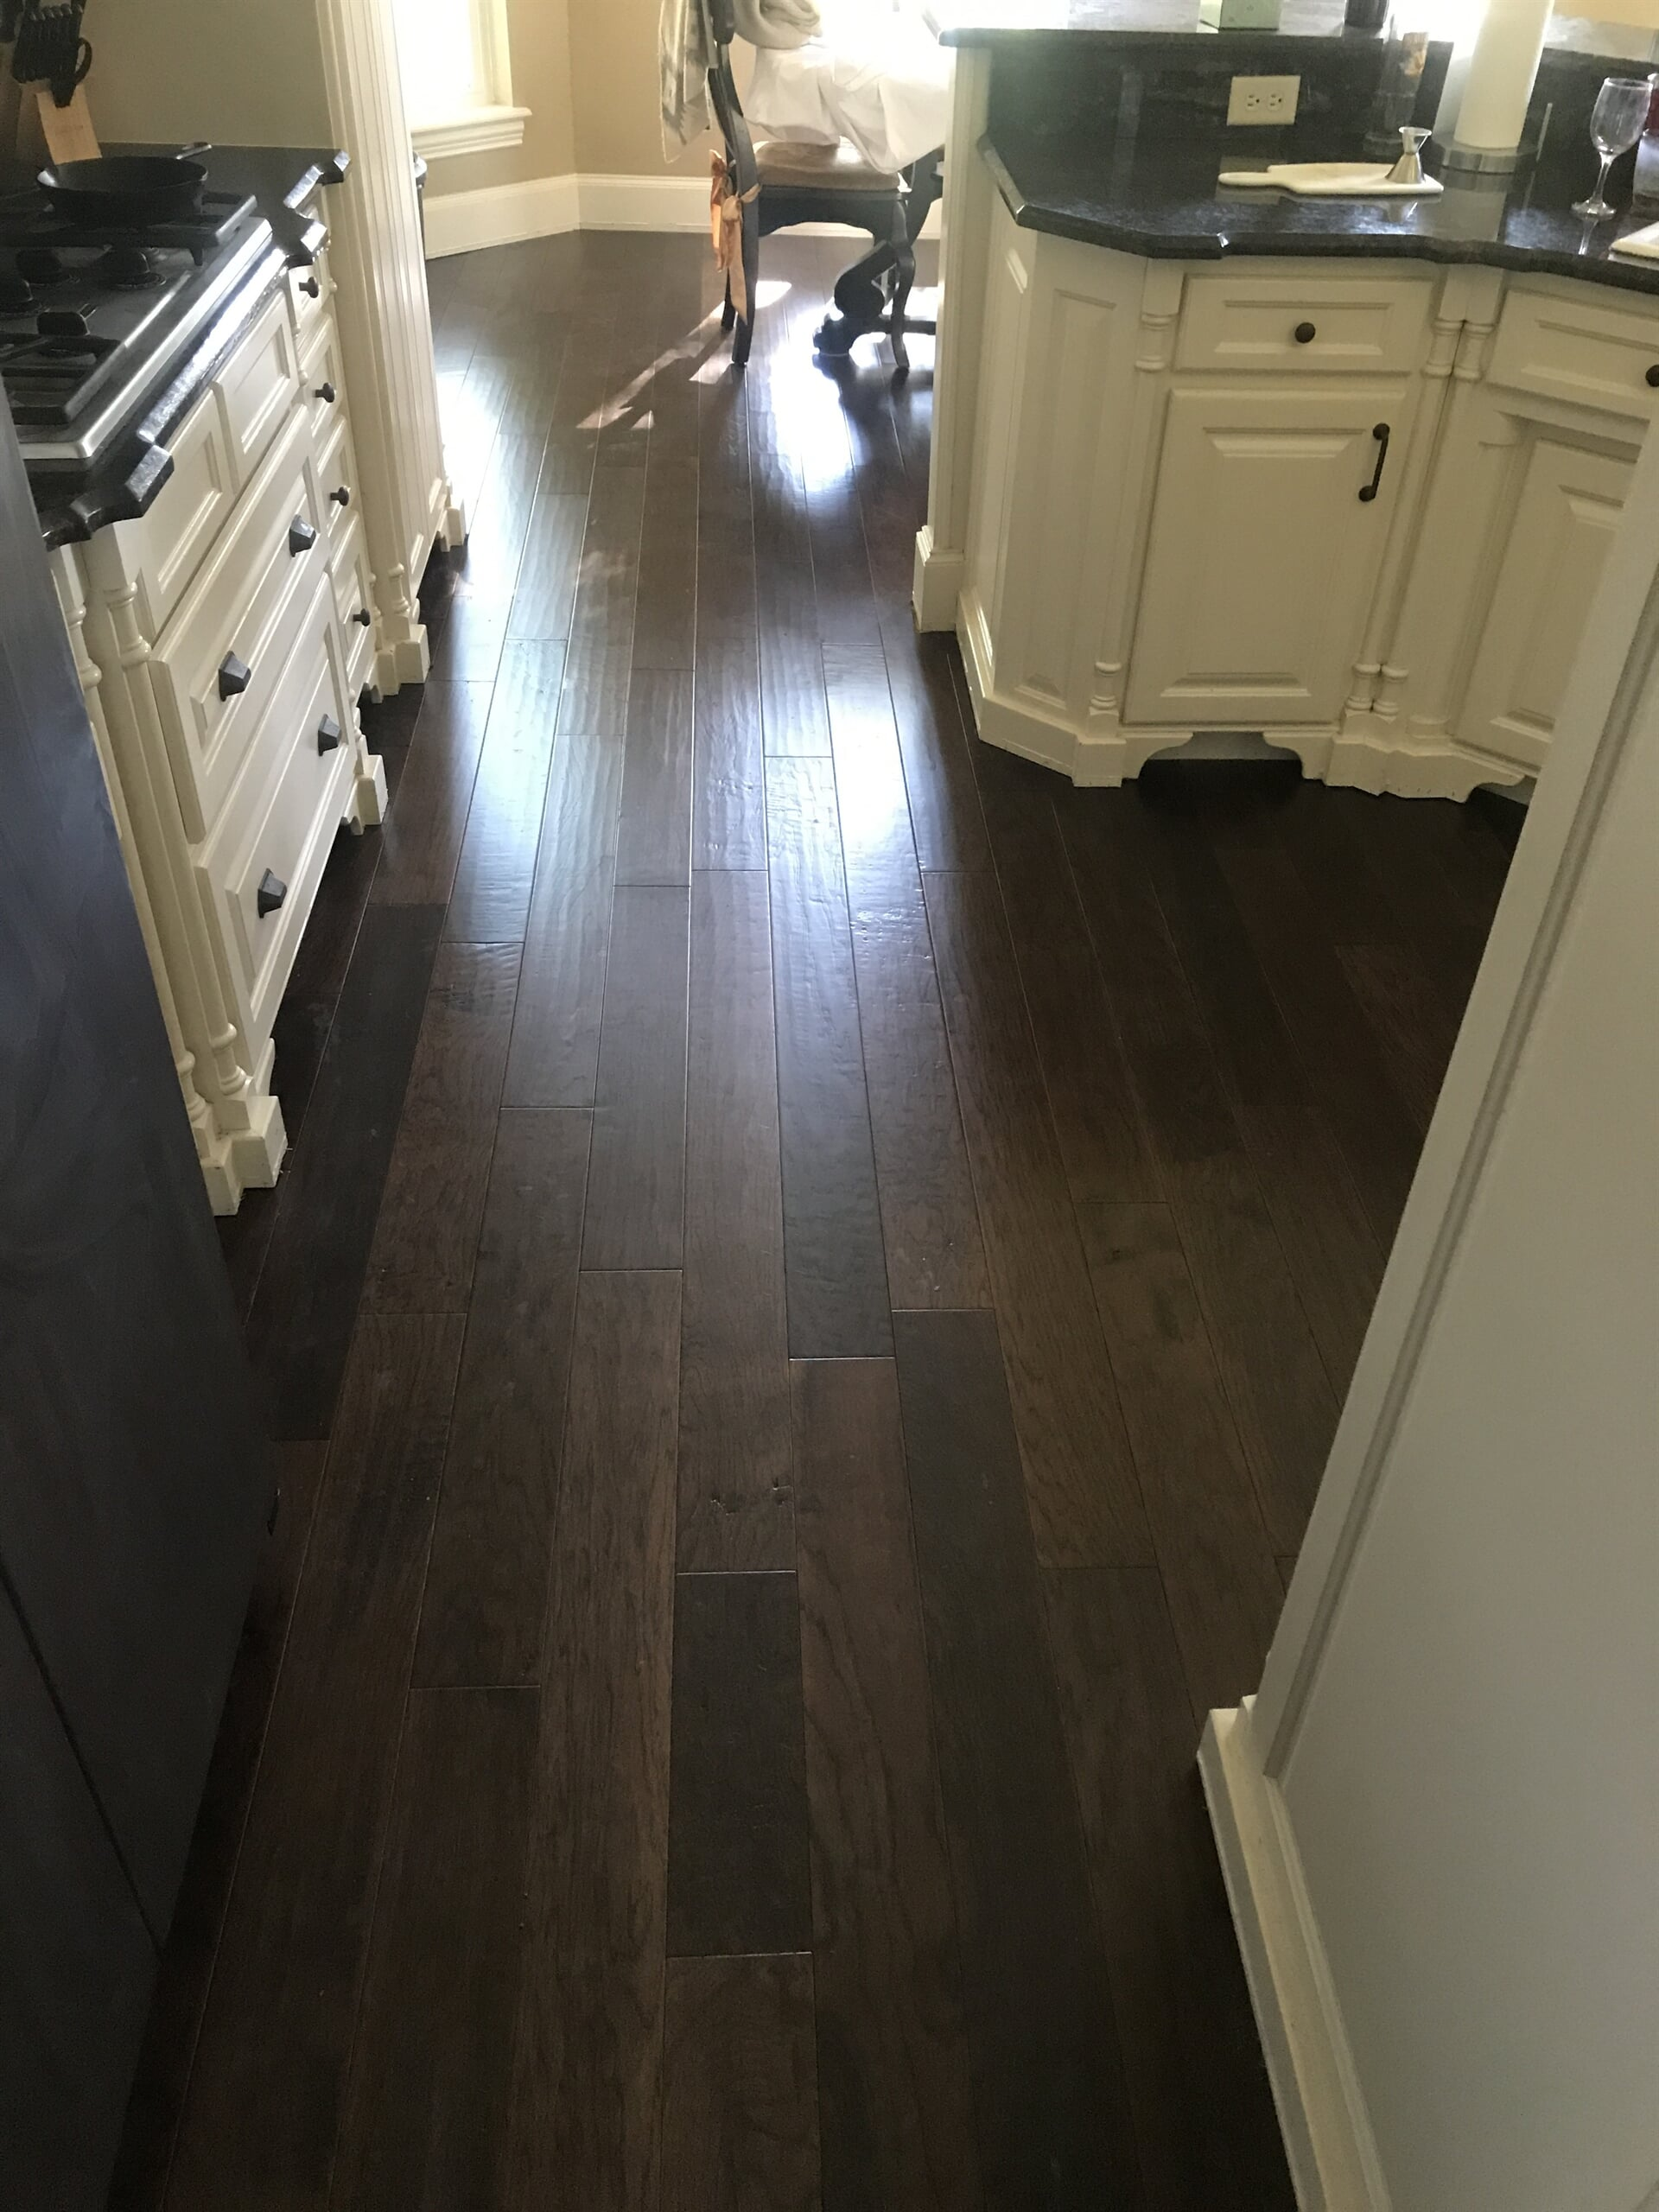 Dark wood look kitchen flooring in Tyler, TX from East Texas Floors